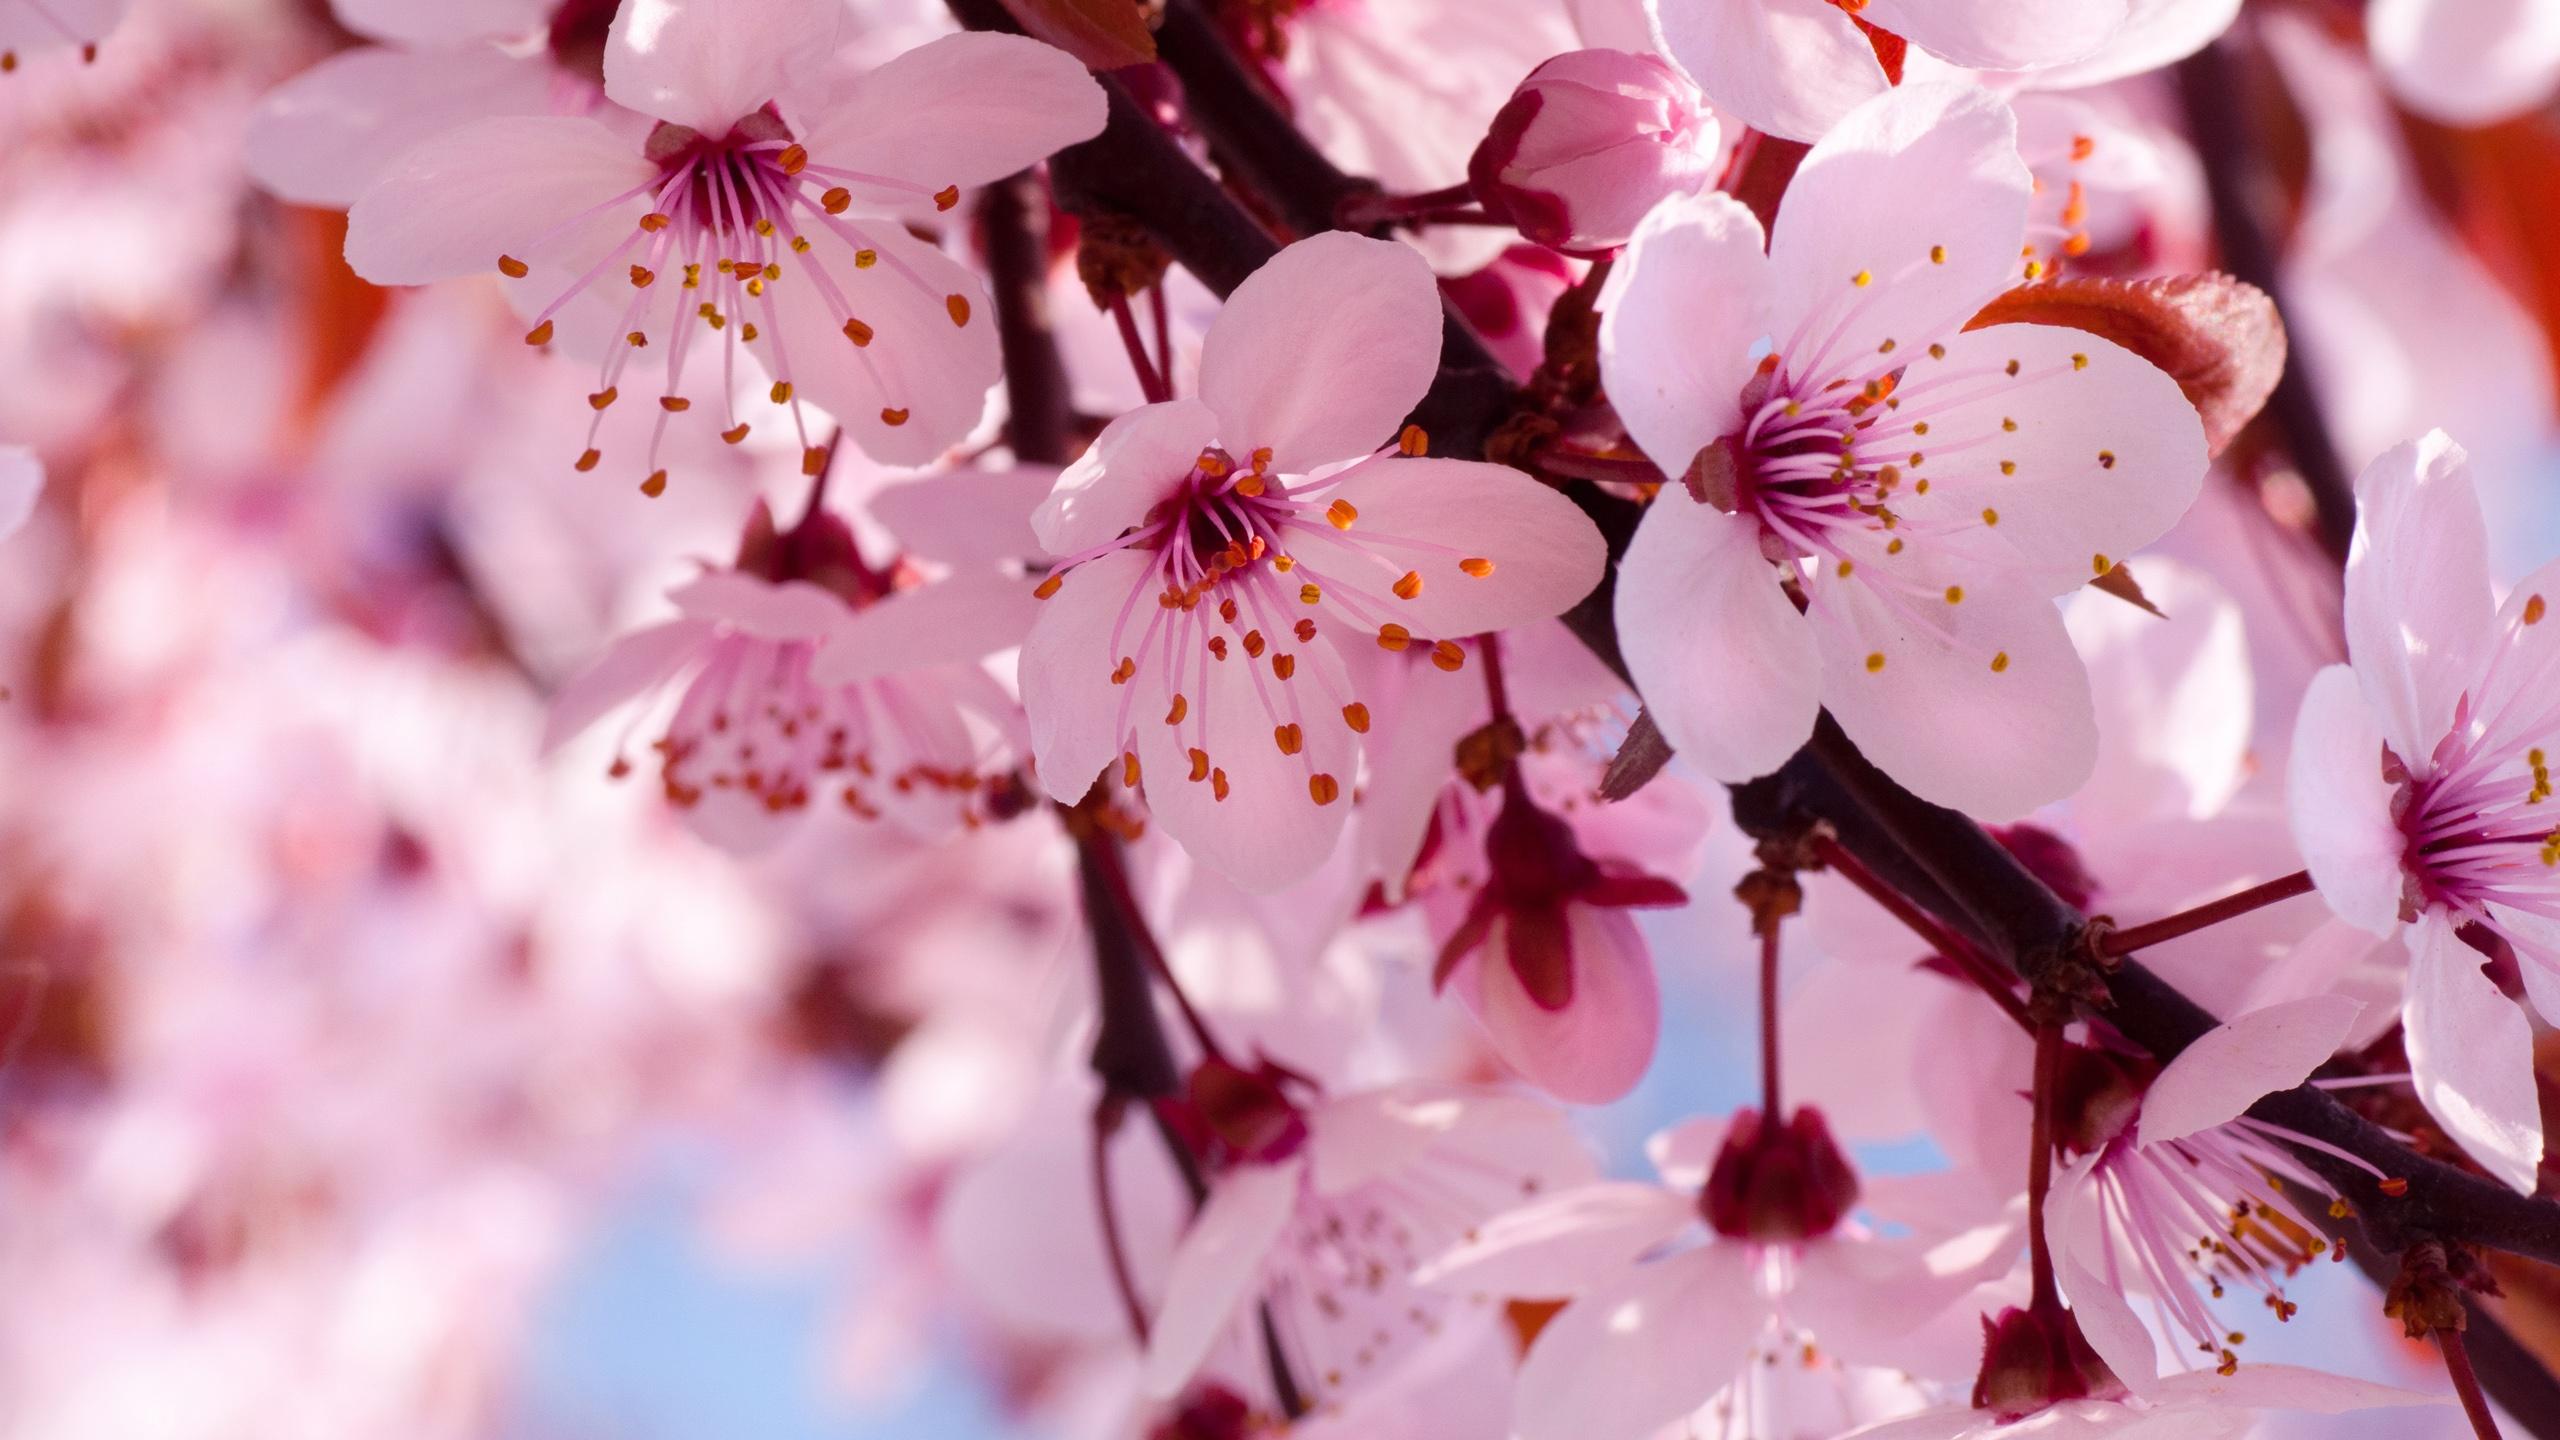 wallpaper spring flowers in full bloom  pink cherry